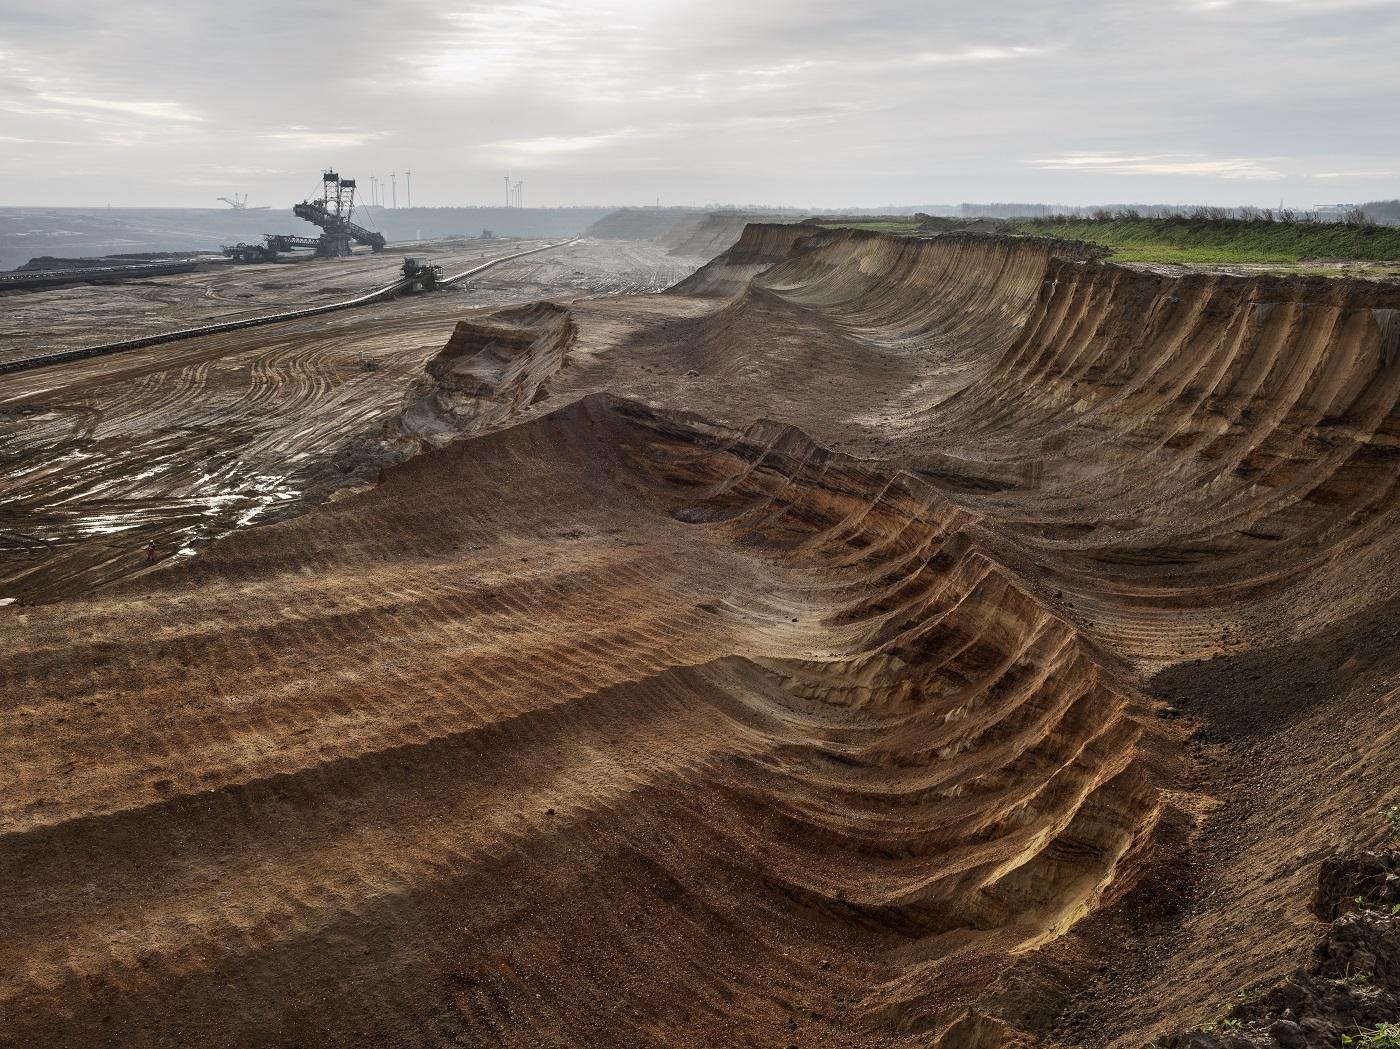 Aerial photo of a coal mine to illustrate the concept of solastalgia